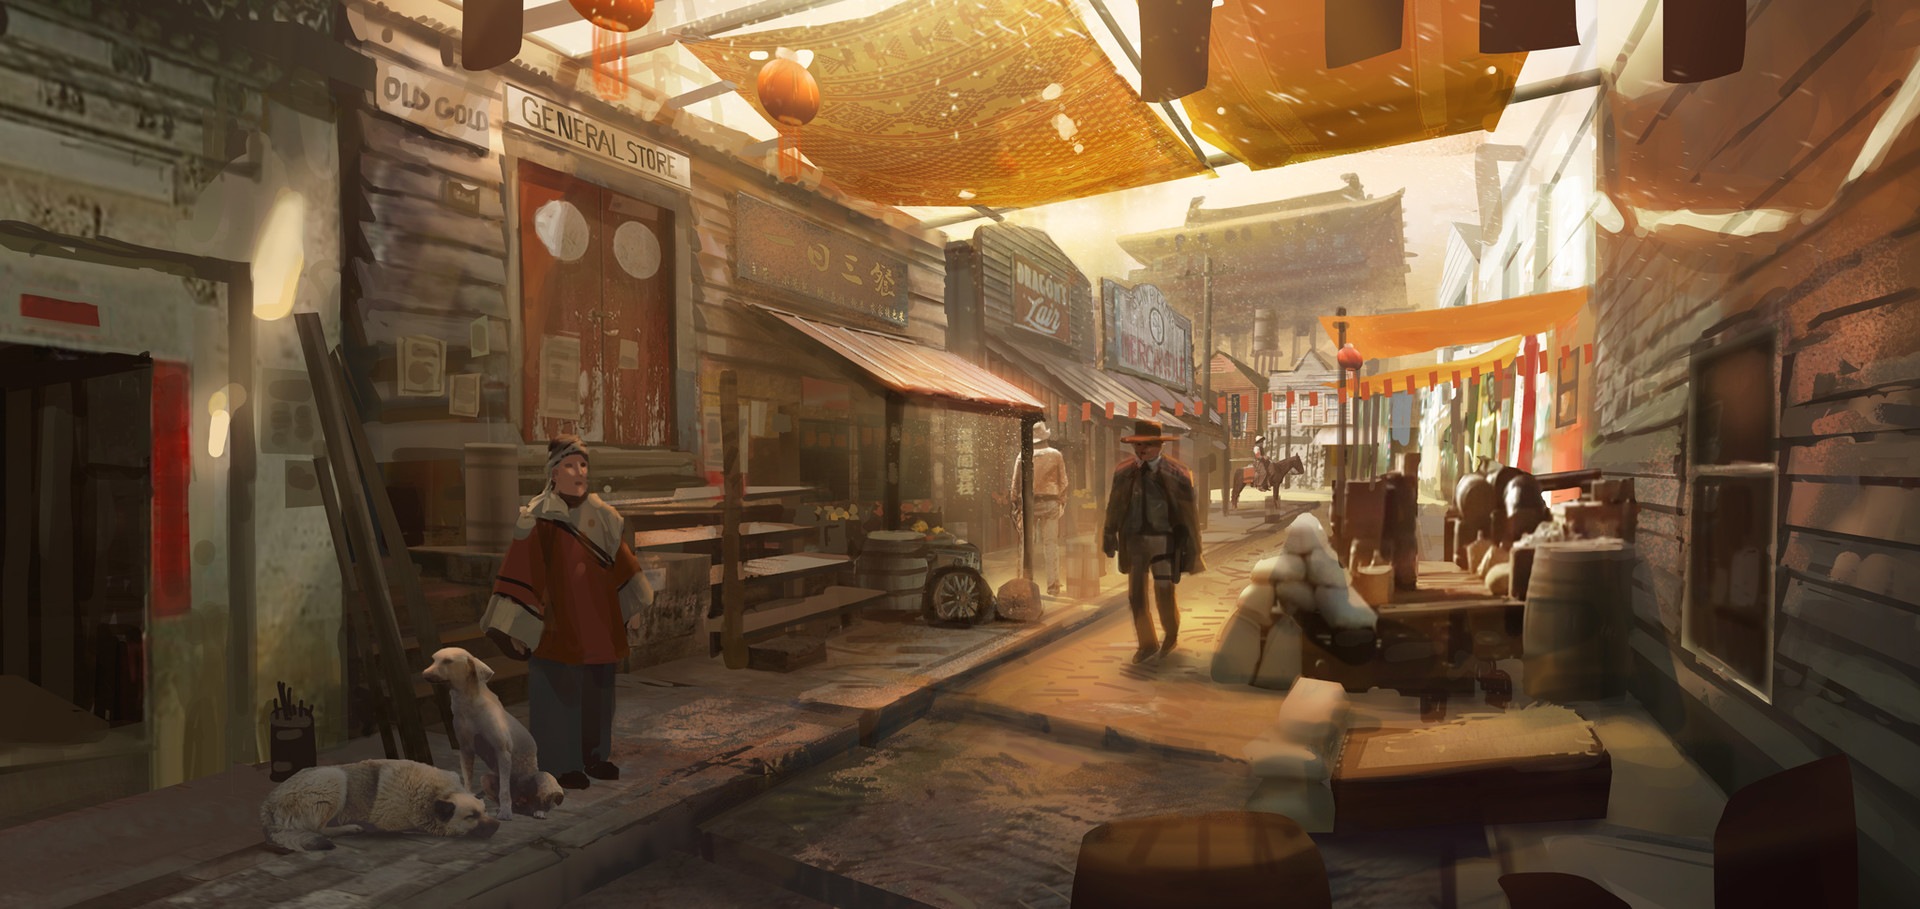 Adrien girod sg hl concept chinatown 02 lowres